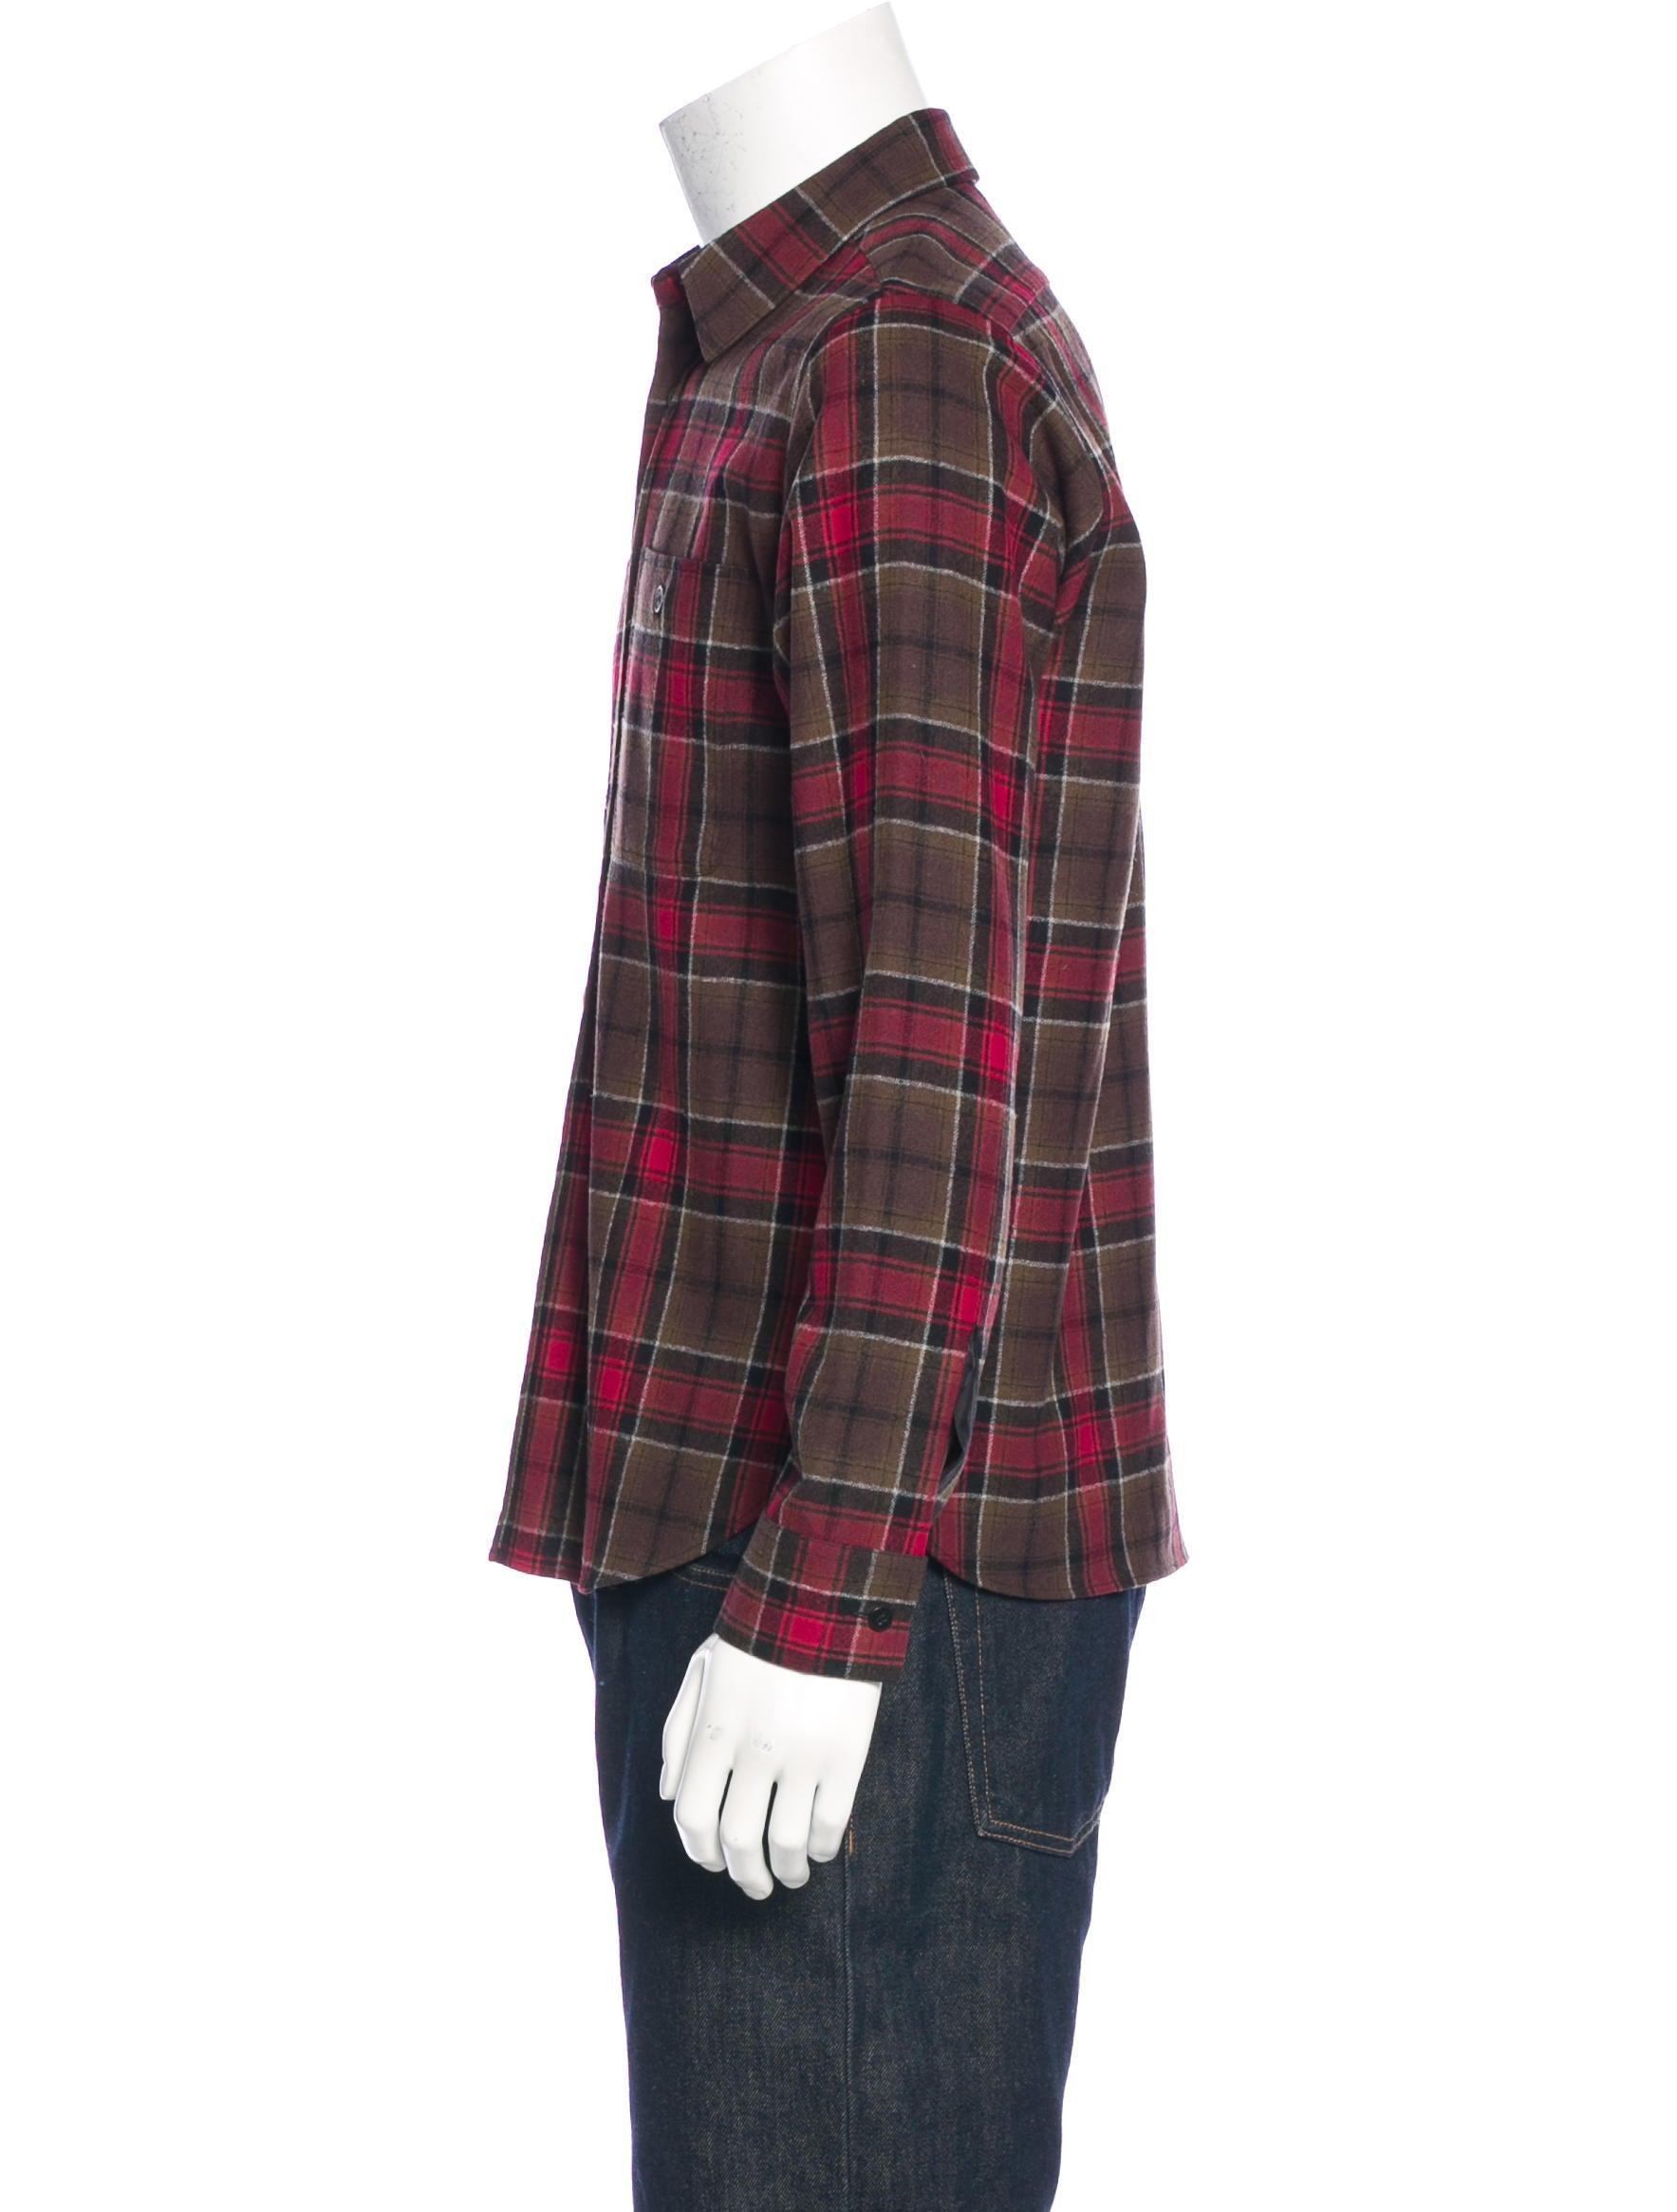 Saint laurent wool plaid flannel shirt clothing for Mens wool flannel shirt